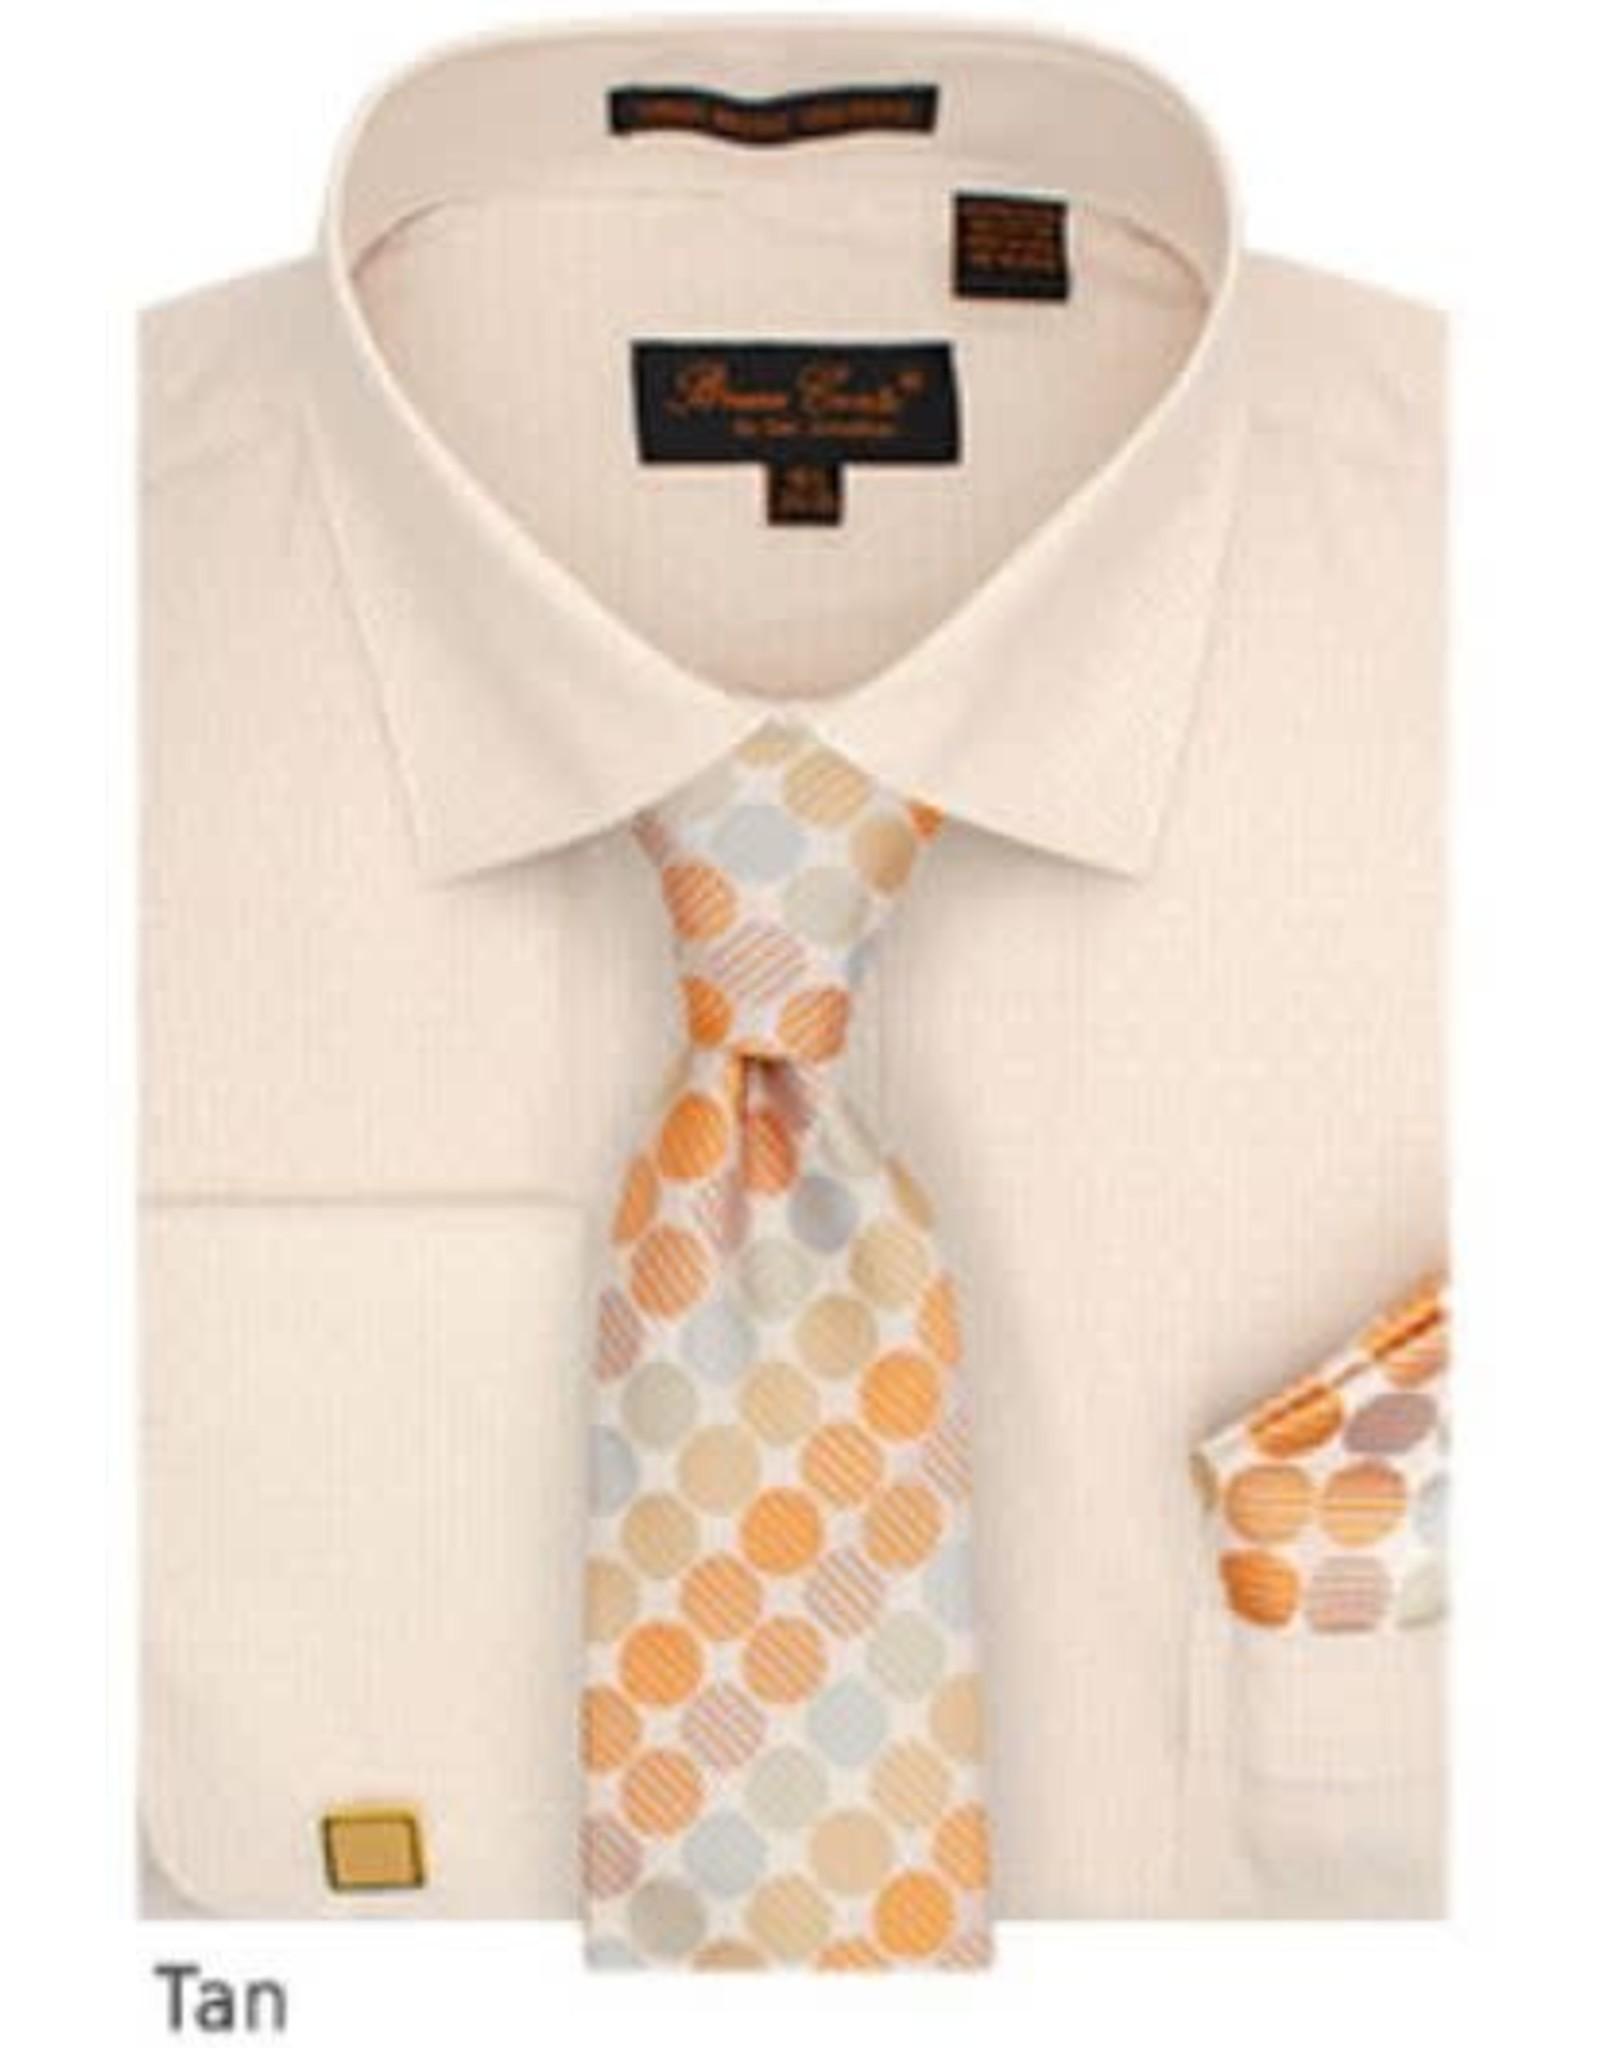 Bruno Conte Bruno Conte Shirt Set CS076 Tan